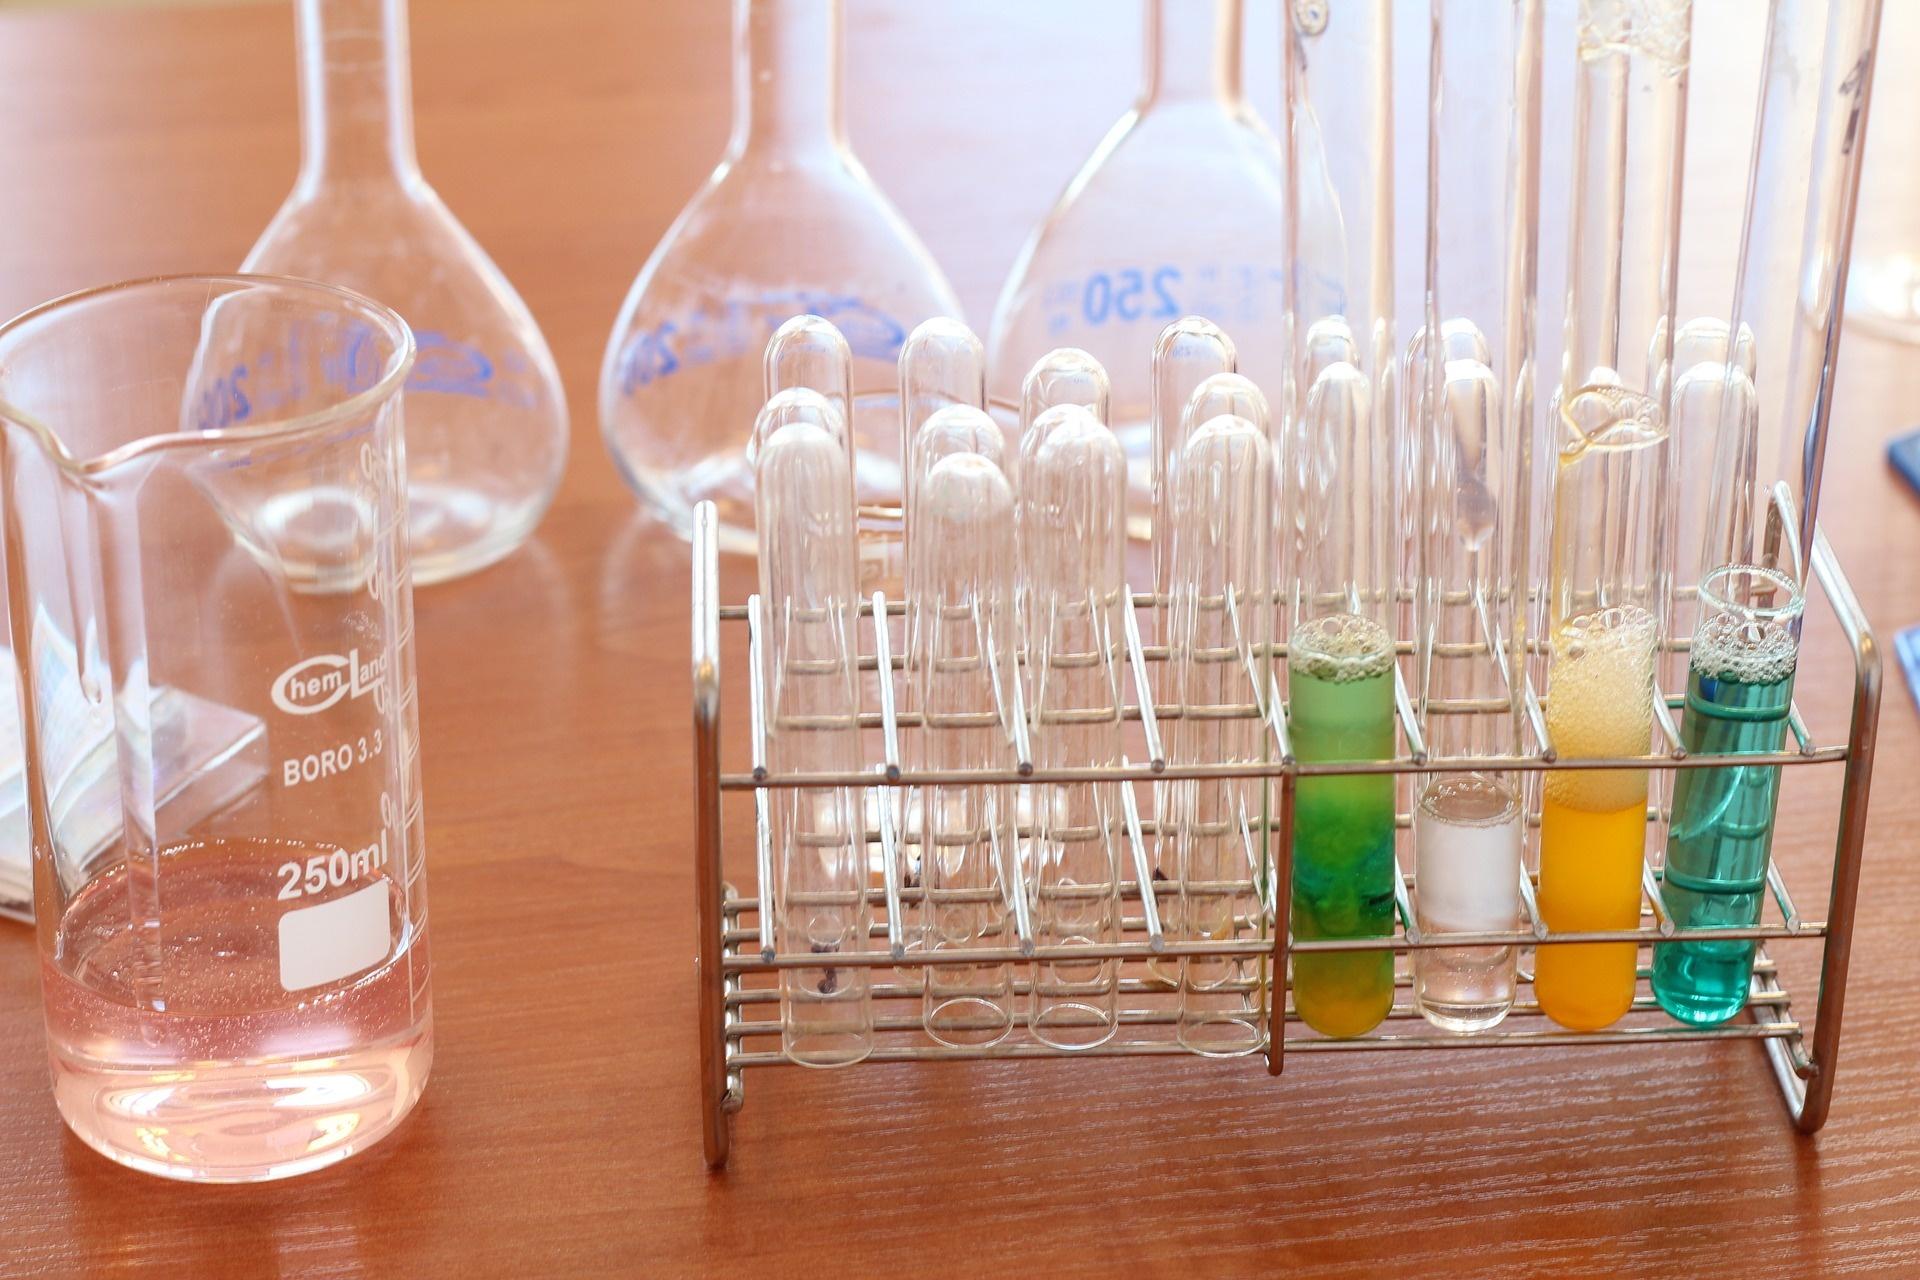 laboratory-1009190_1920.jpg